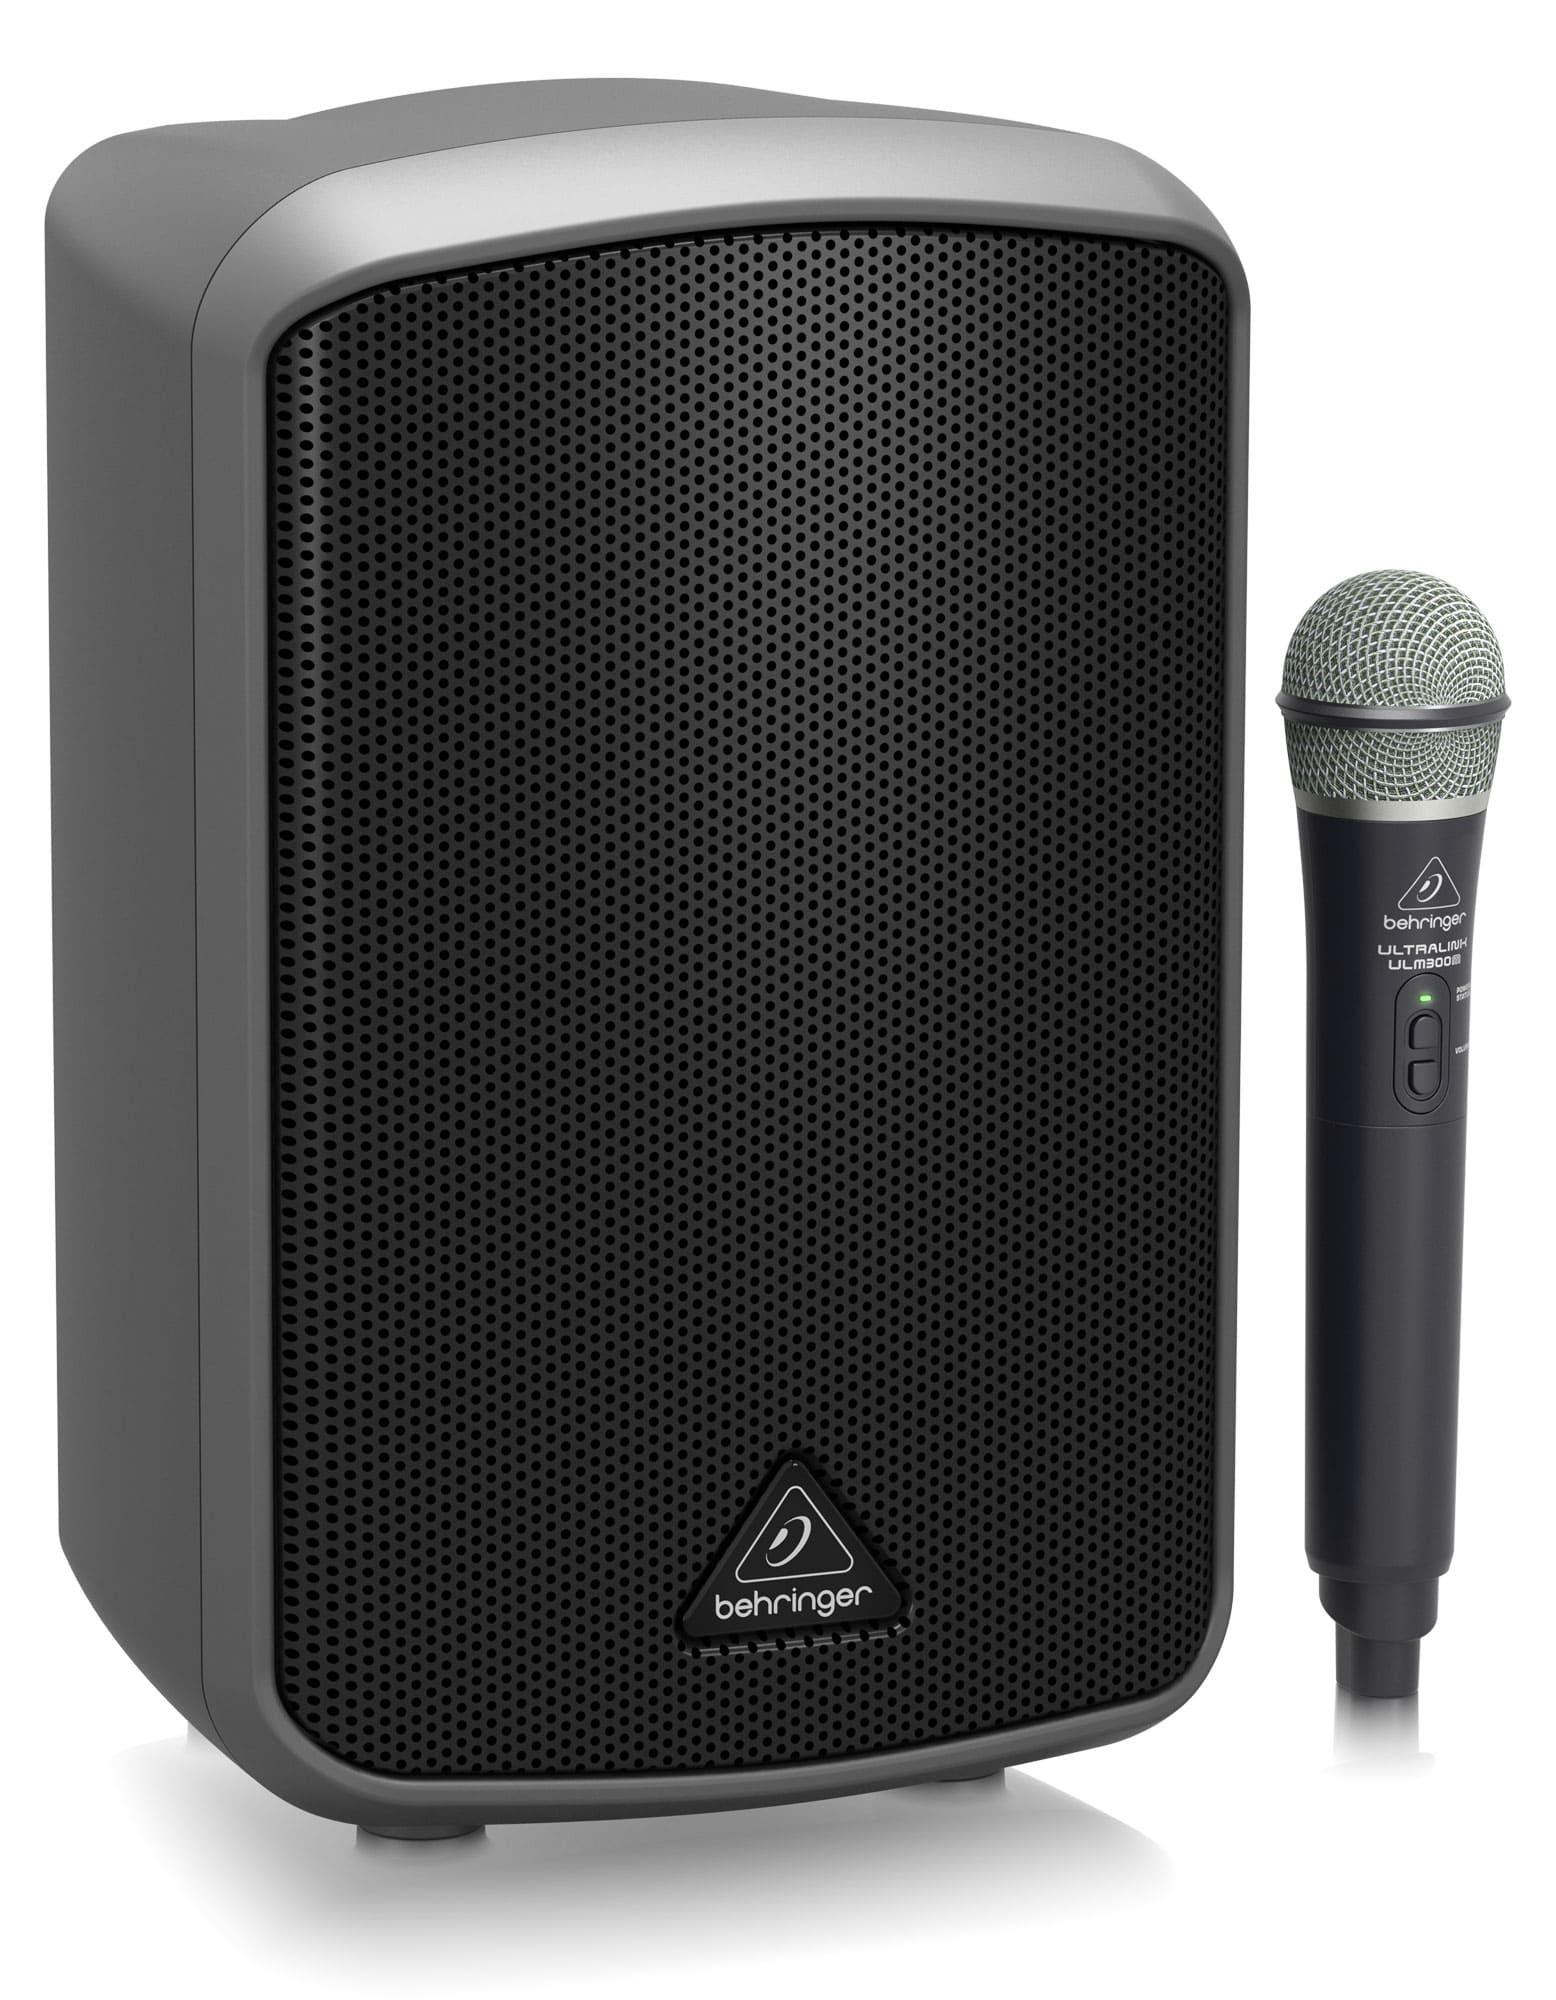 Paboxen - Behringer MPA100BT Bluetooth Lautsprecher - Onlineshop Musikhaus Kirstein